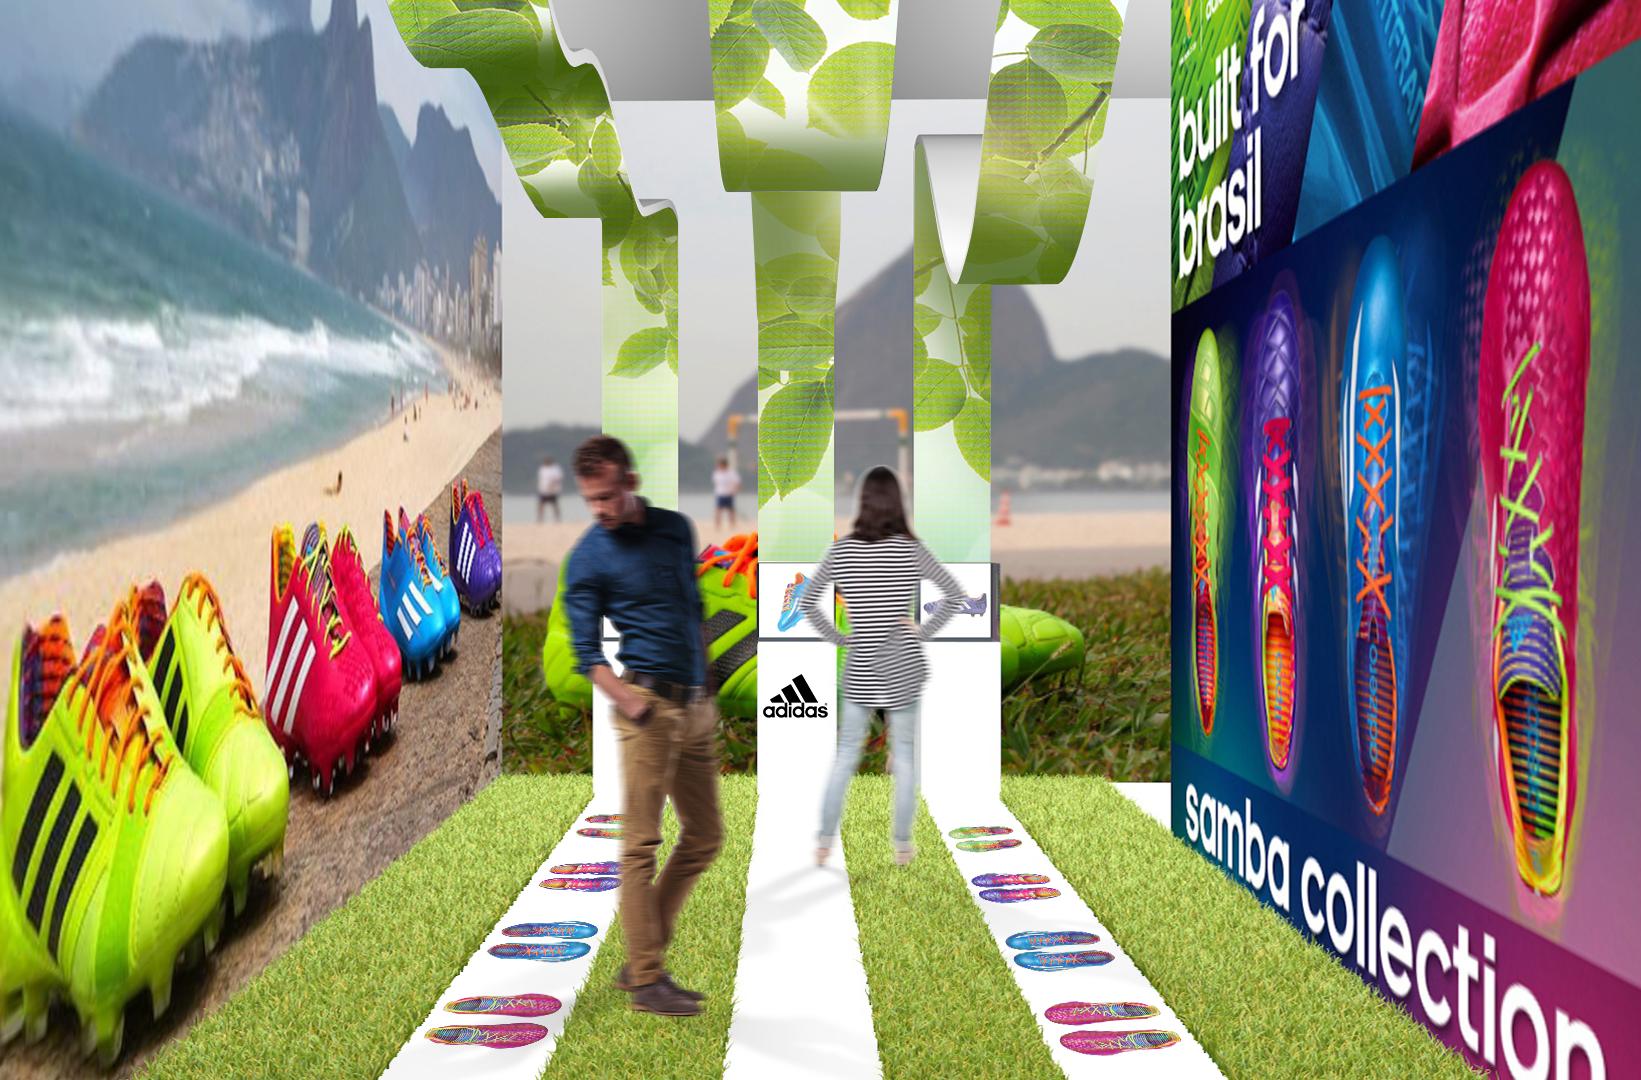 Adidas showroom / 3d entrance